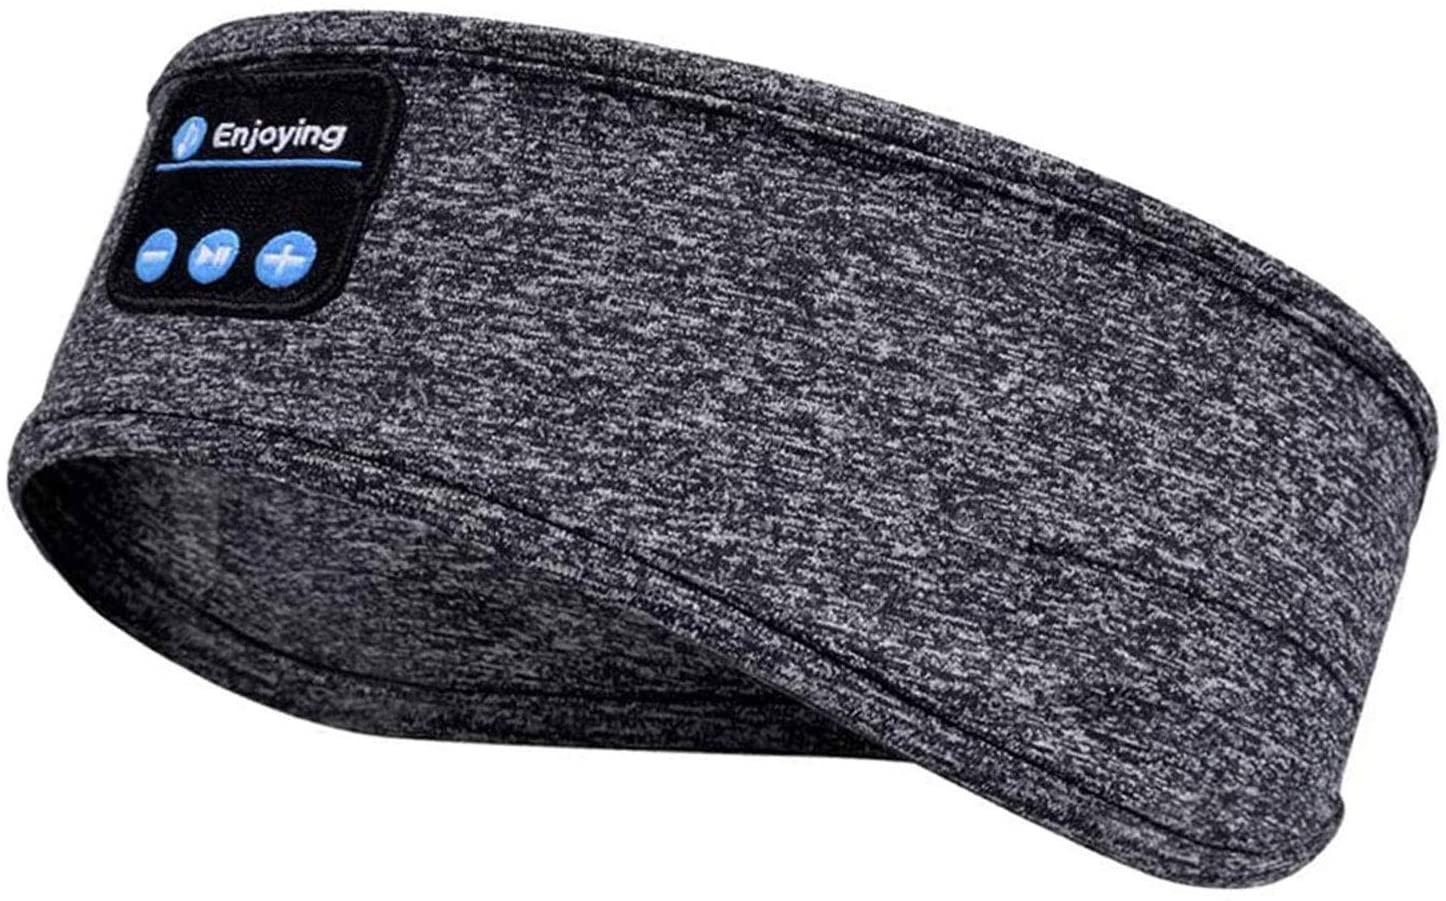 Tiandirenhe Sleep Headphones Headband, Bluetooth 5.0 Wireless Music Sports Headband Headphones with Micphone for Workout, Running, Jogging, Yoga, Insomnia Side Sleepers (Grey)